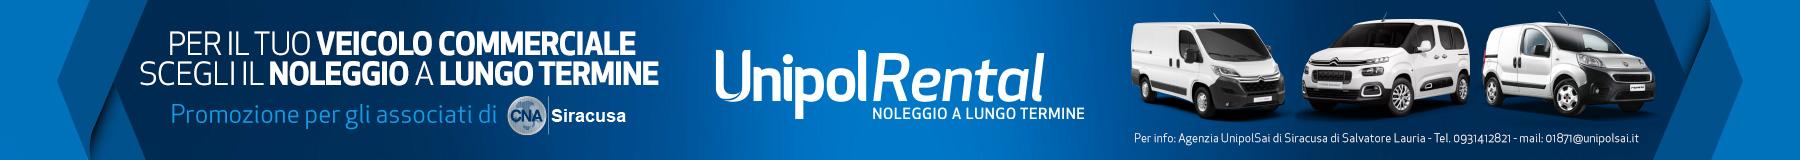 Unipol Rental